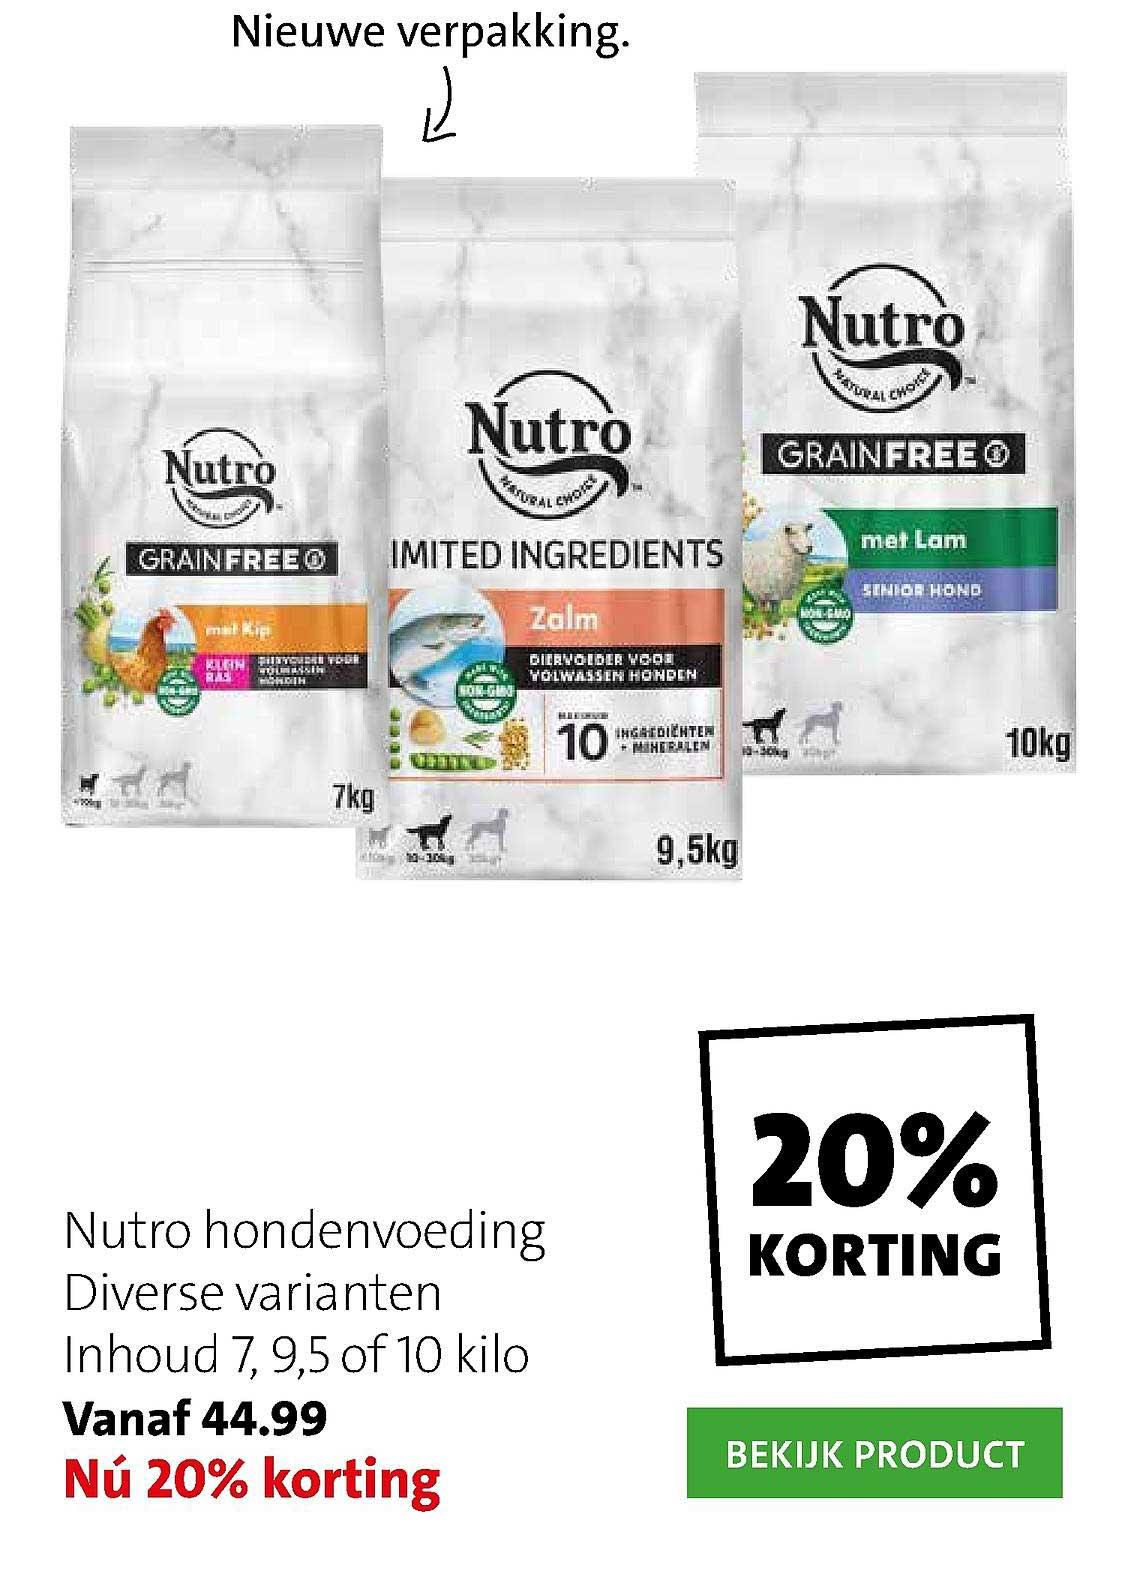 Intratuin Nutro Hondenvoeding 20% Korting